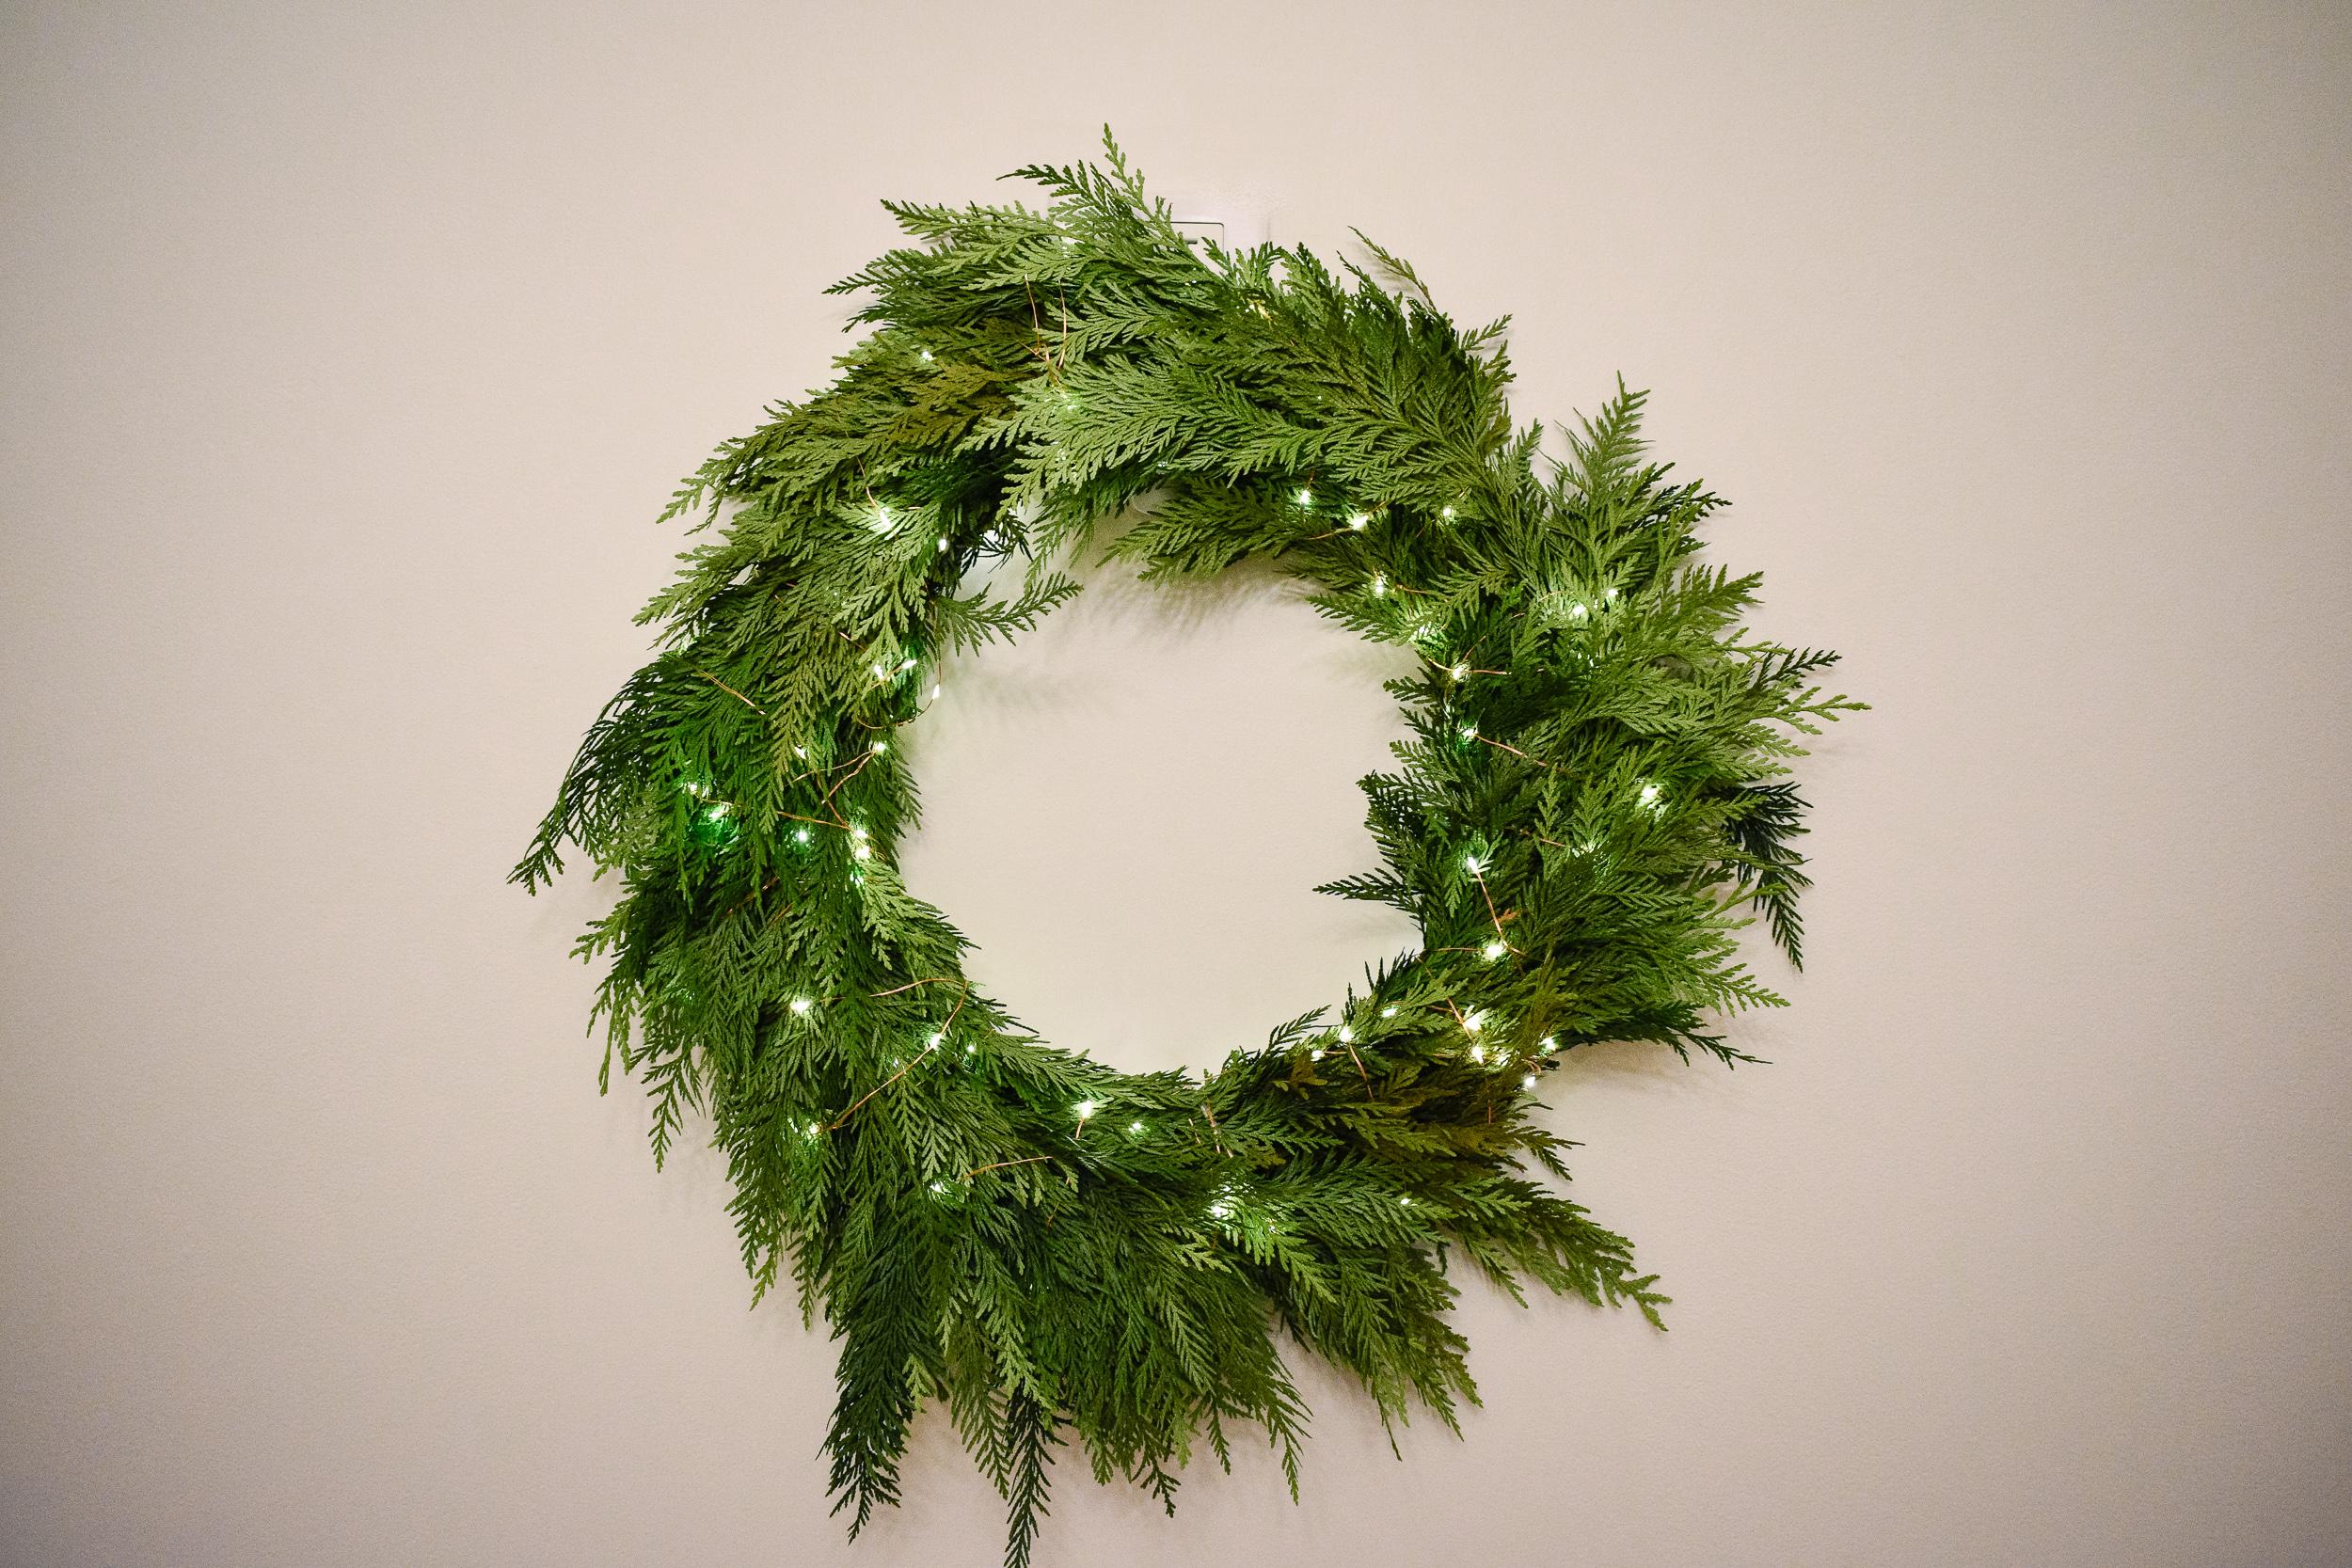 Minimalist Christmas Decorations: Wreath